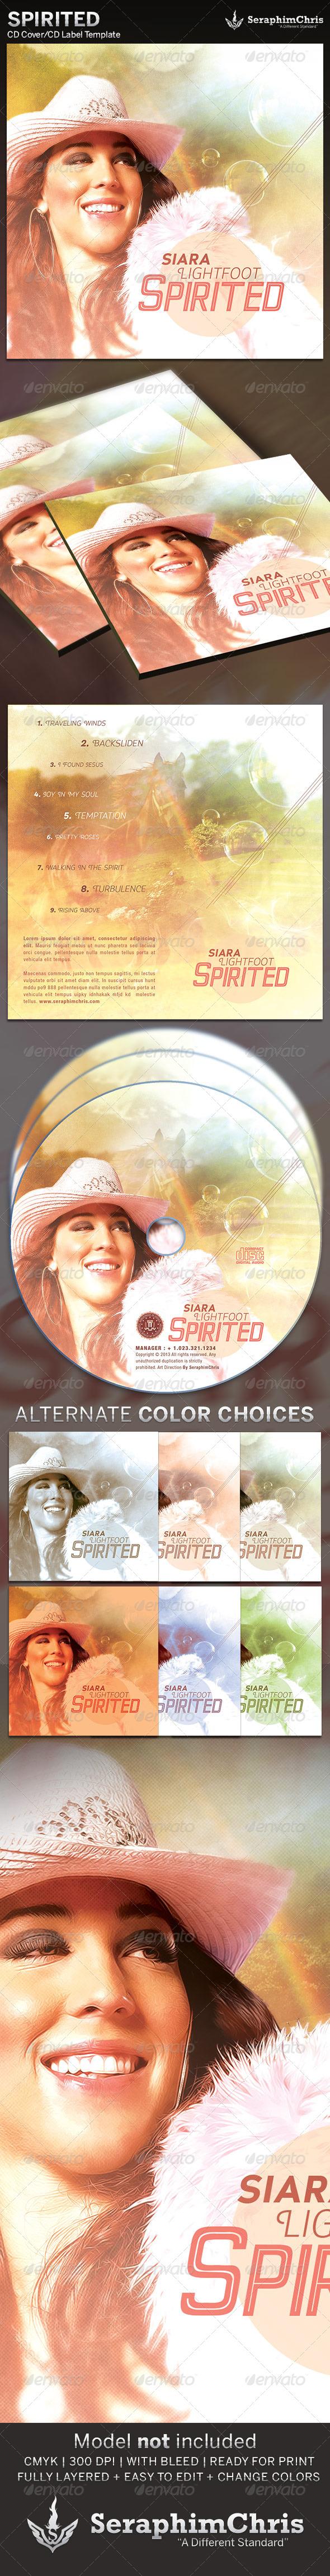 Spirited: CD Cover Artwork Template - CD & DVD Artwork Print Templates